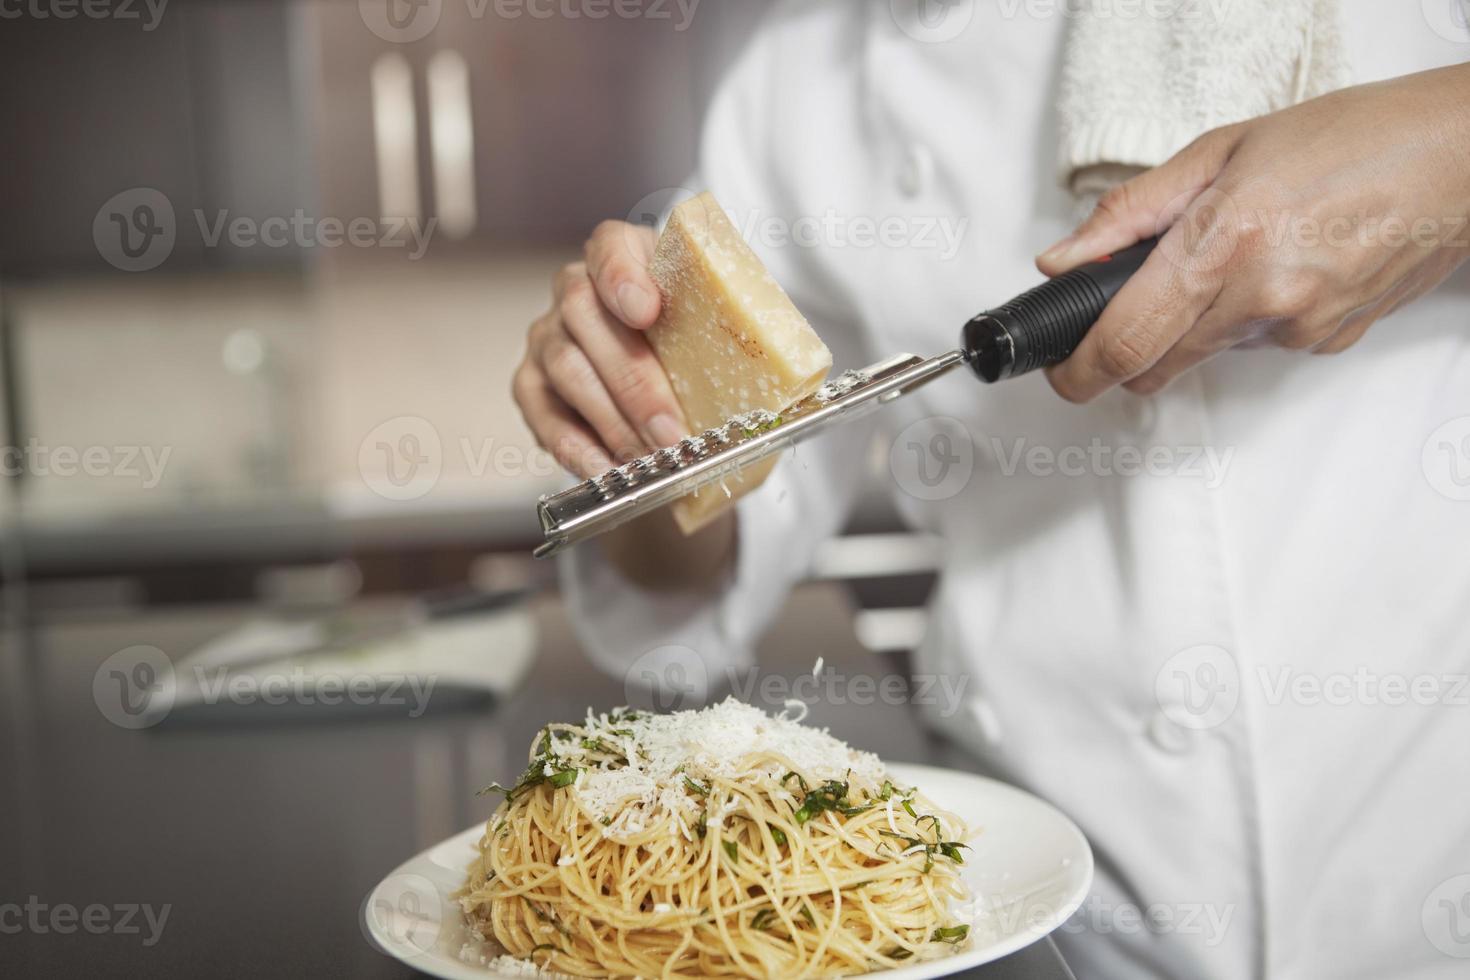 chef-kok kaas raspen op pasta in de keuken foto